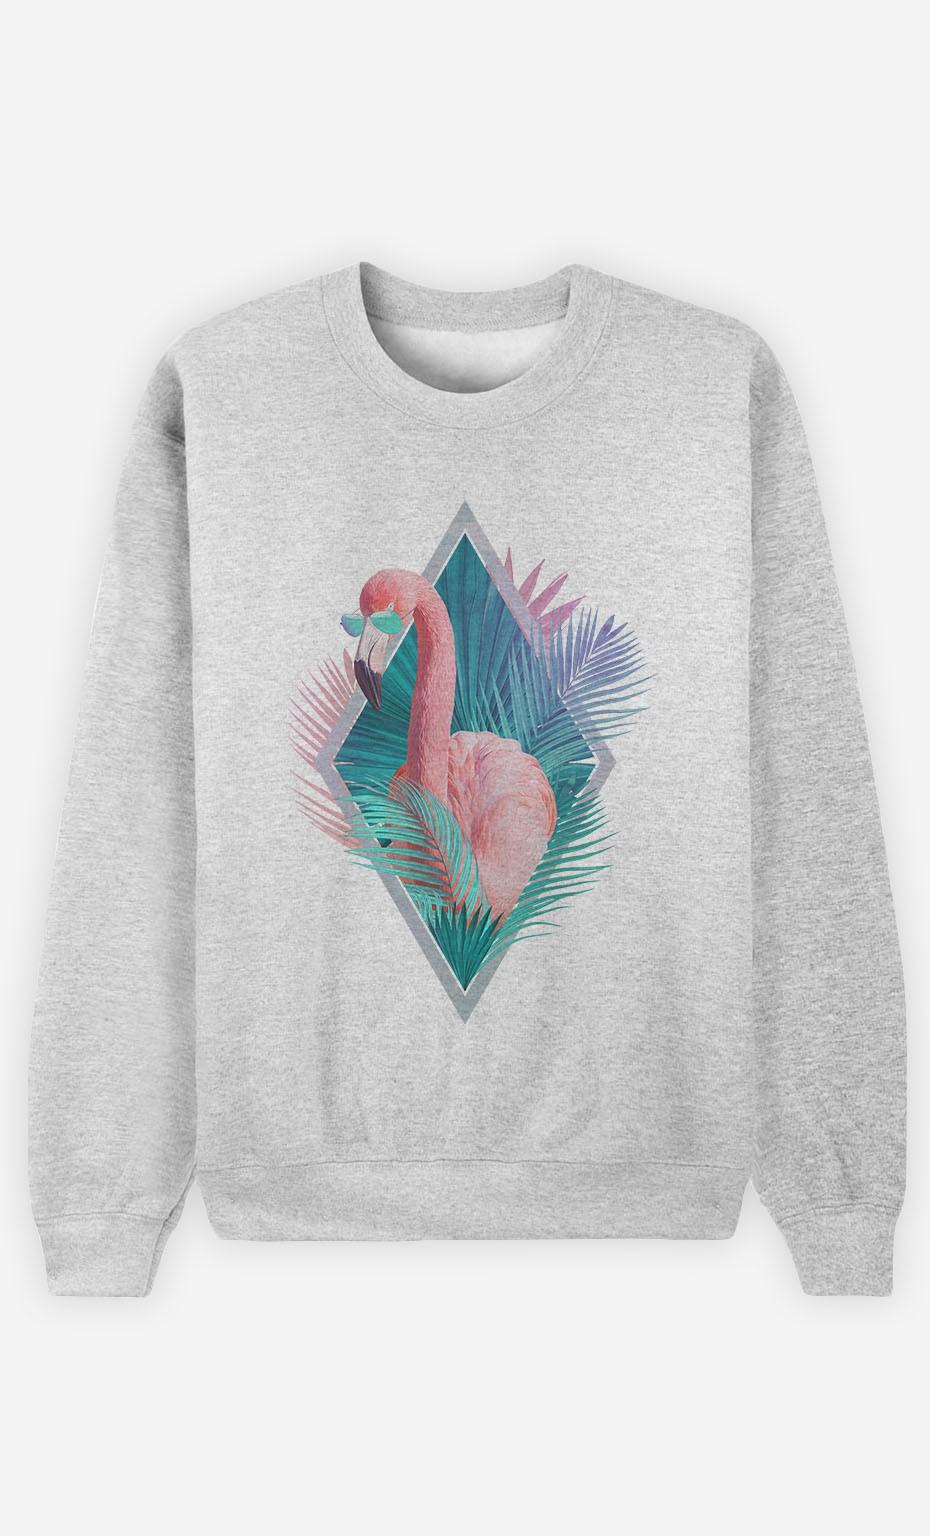 Sweatshirt Tropical Vibes